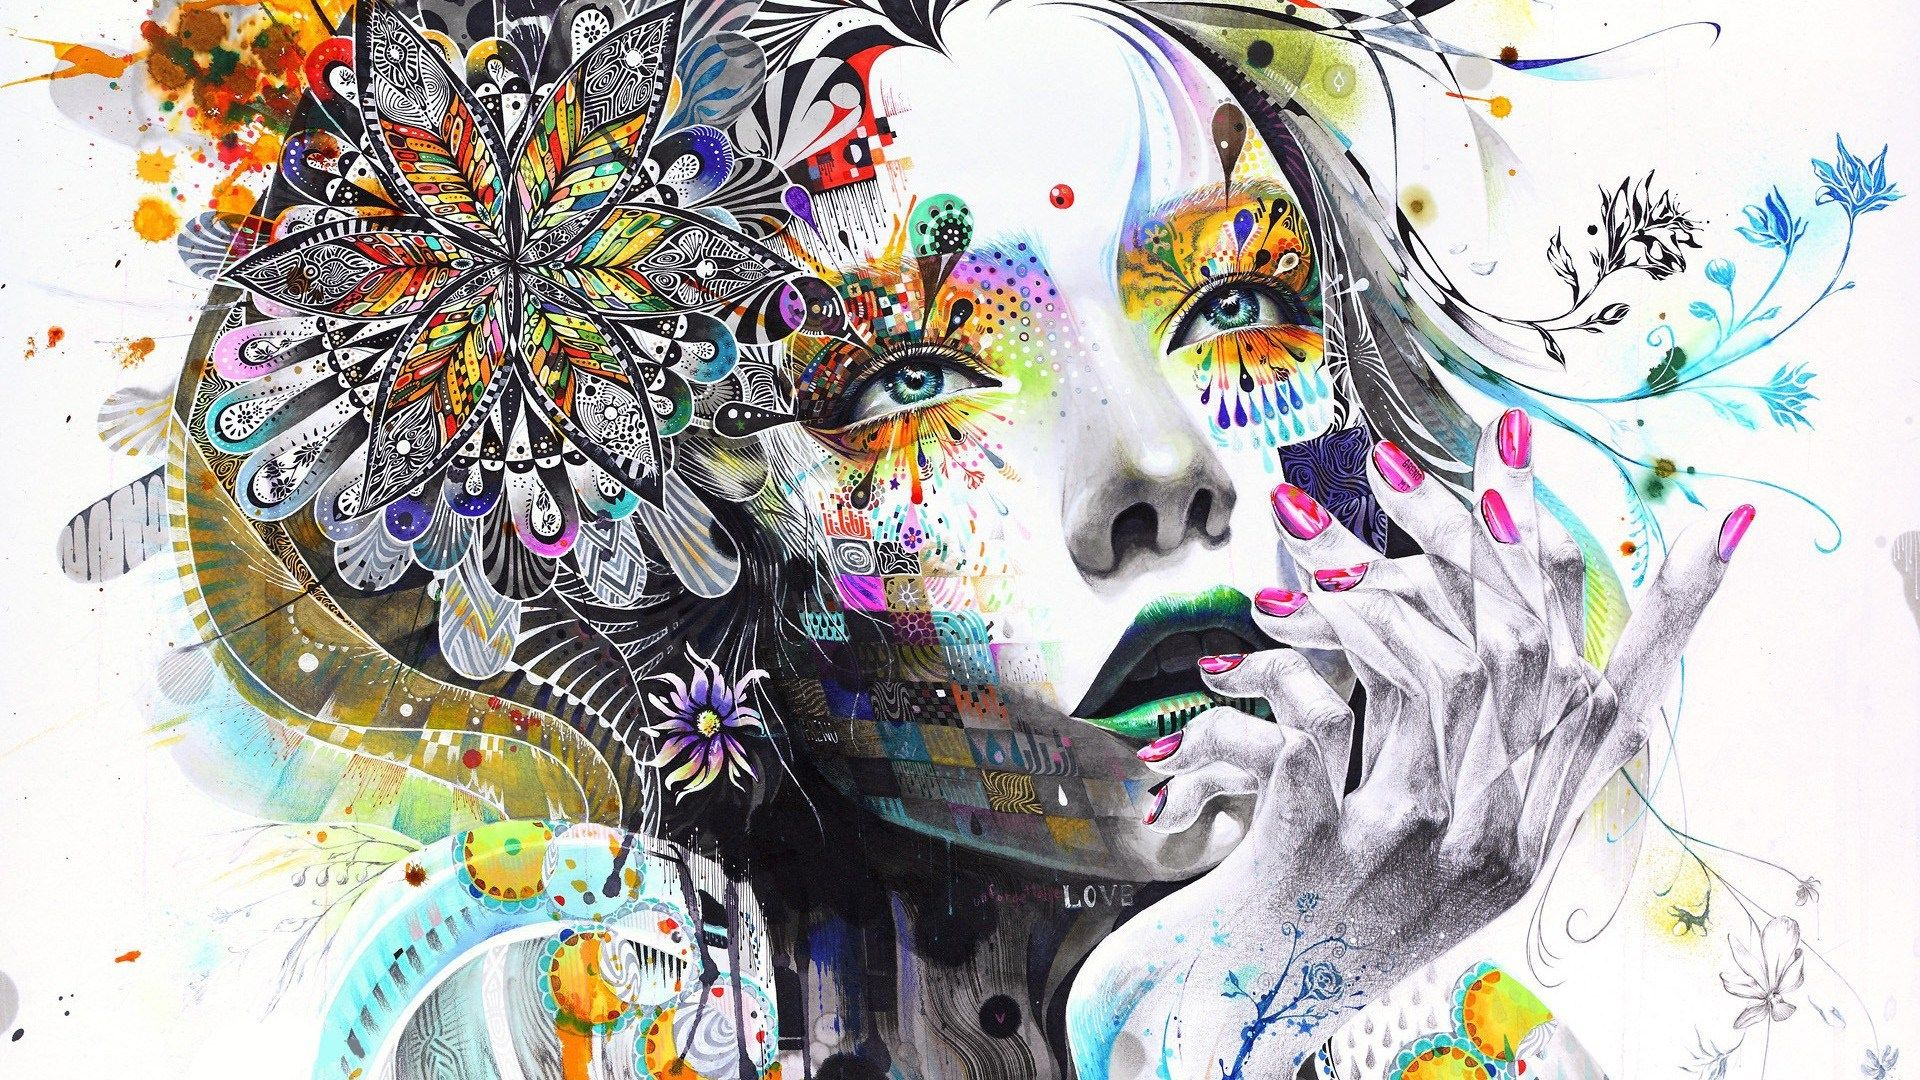 Art Image Hd x